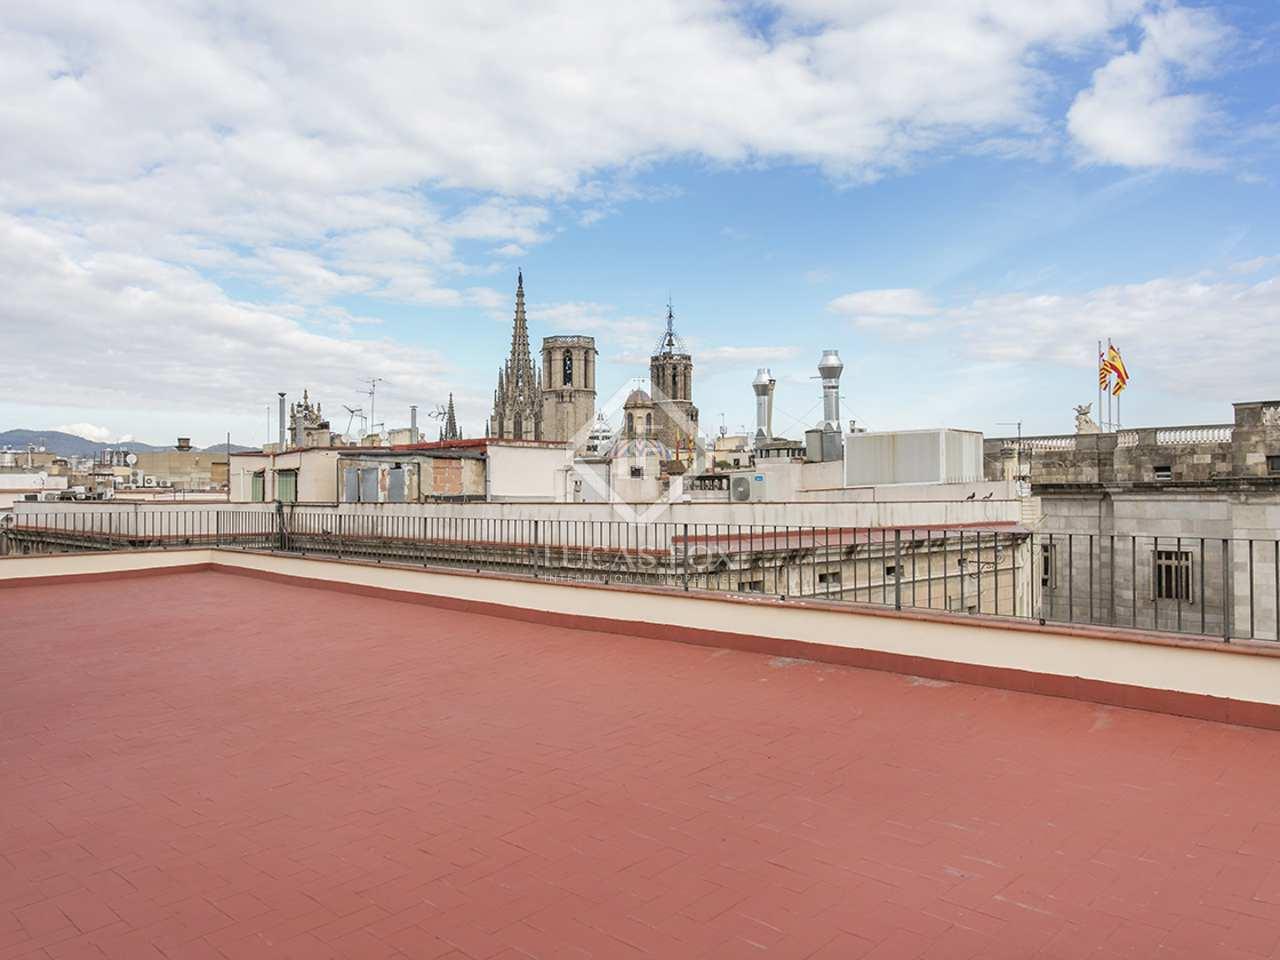 Appartement de 130m a vendre g tico barcelone - Appartement de vacances barcelone mesura ...